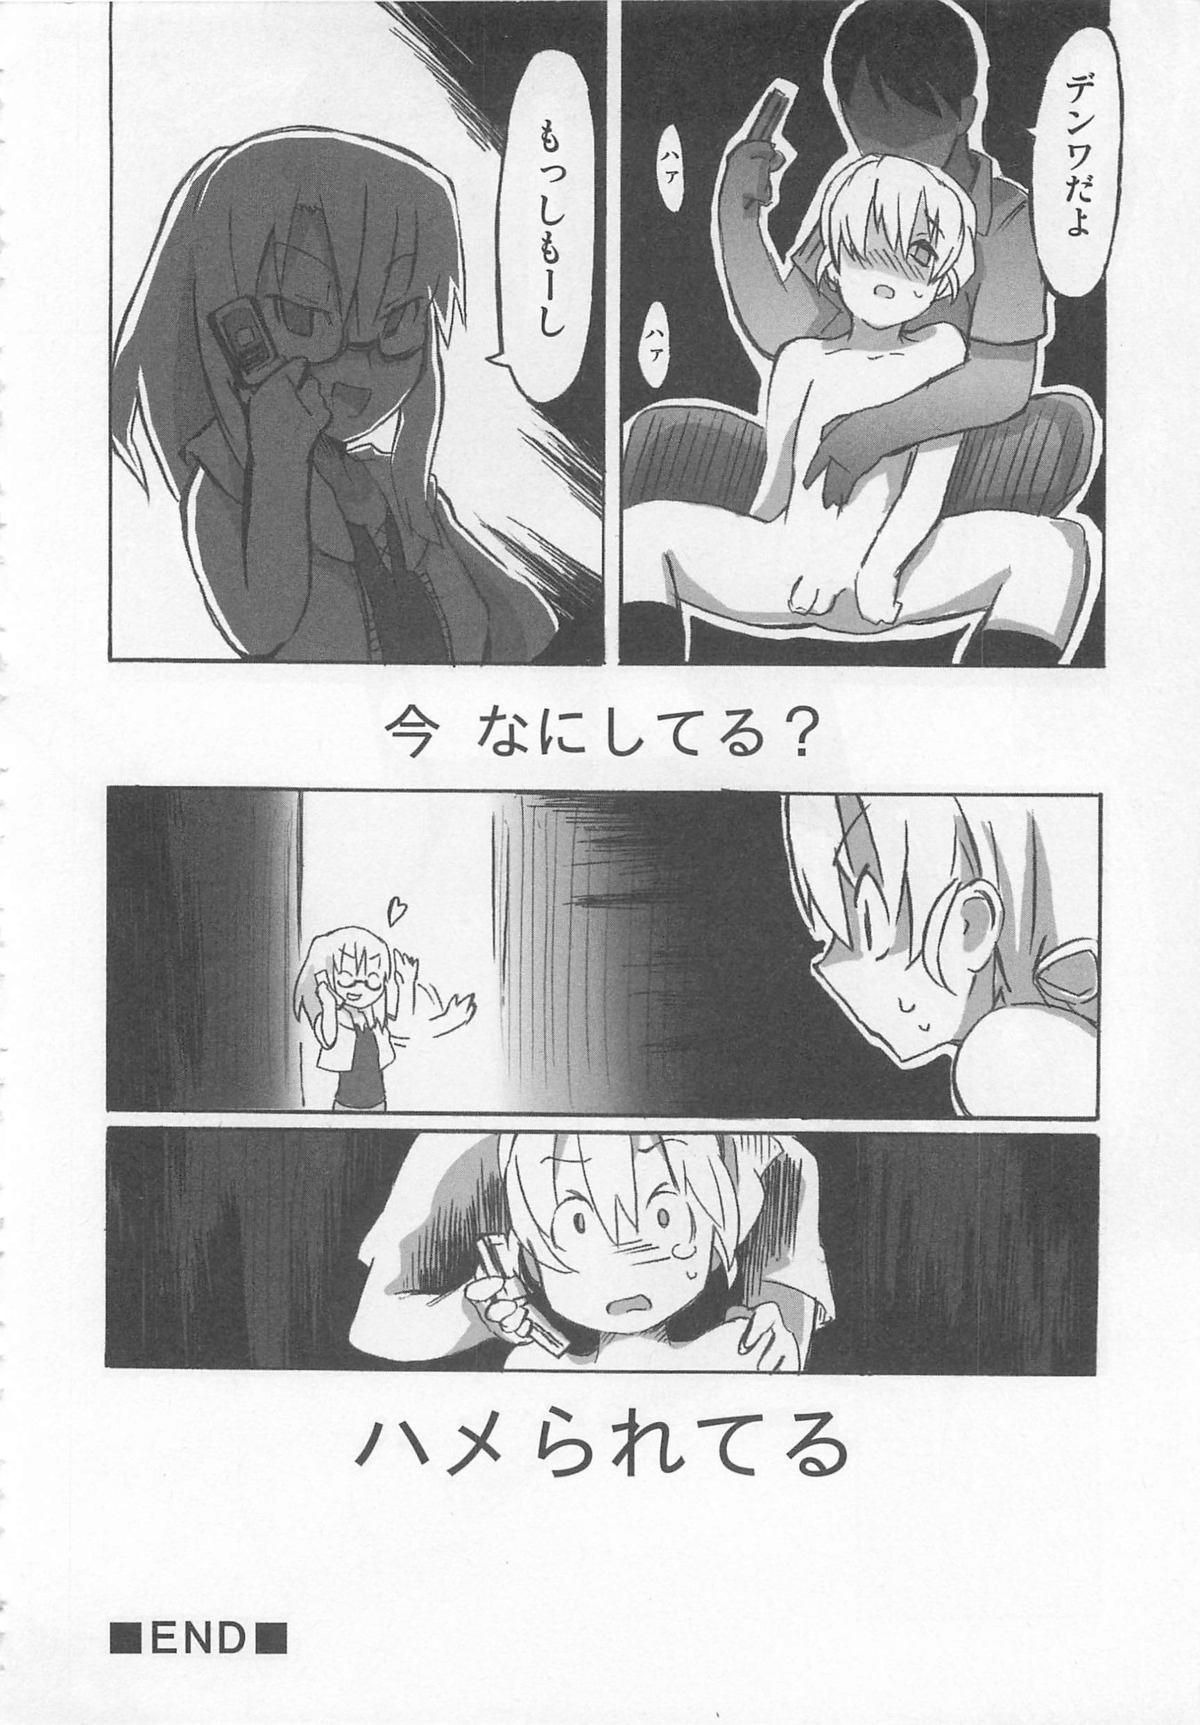 Otokonoko HEAVEN Vol. 02 Dokidoki Chikan Taiken 62